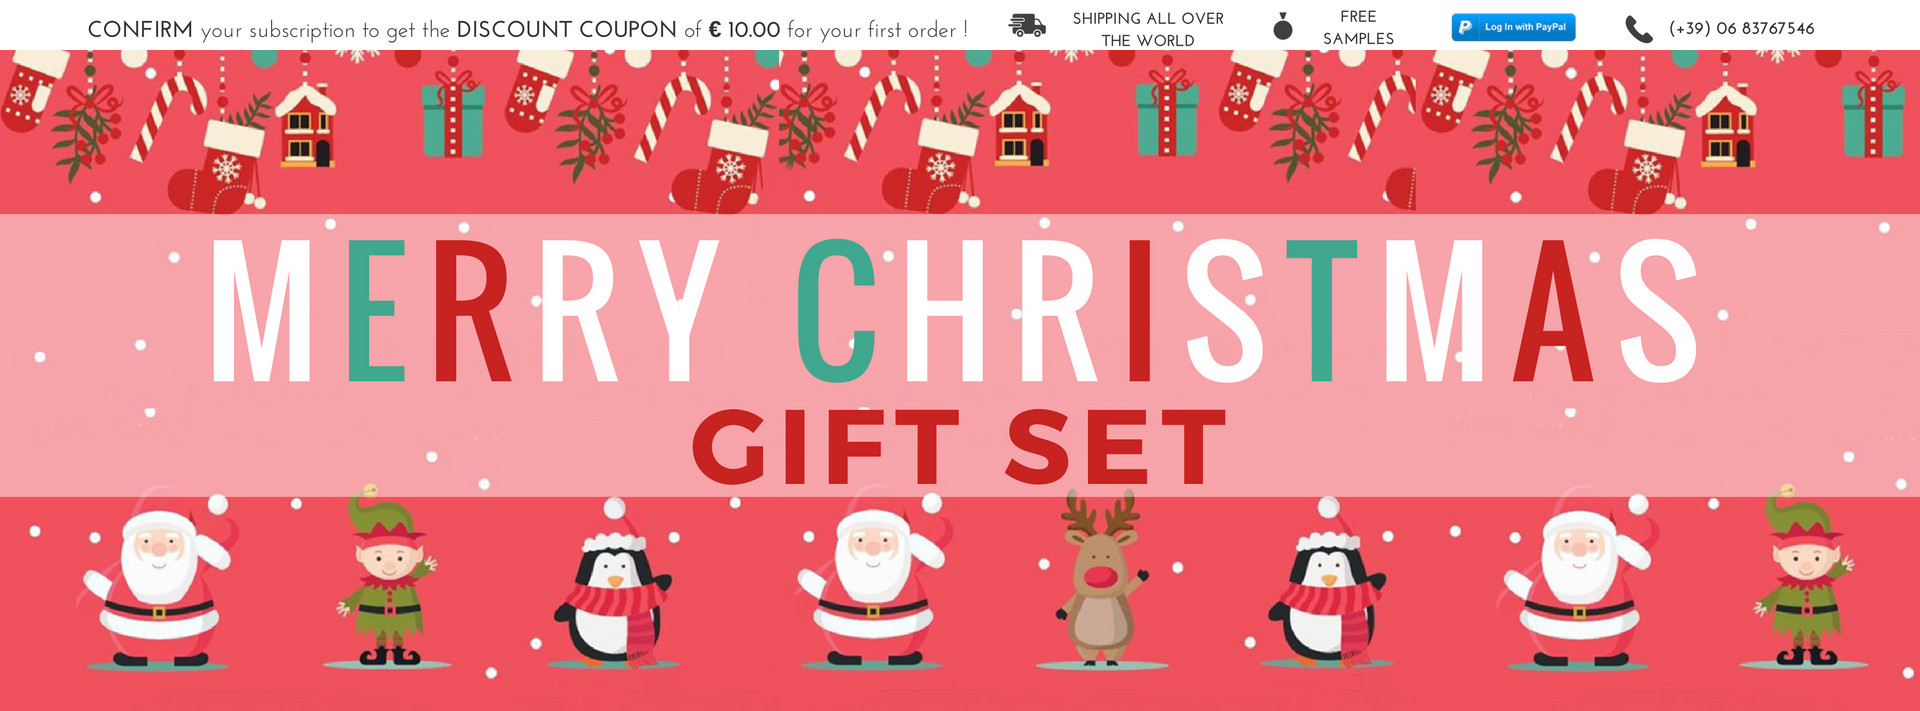 Gift Set Ideas